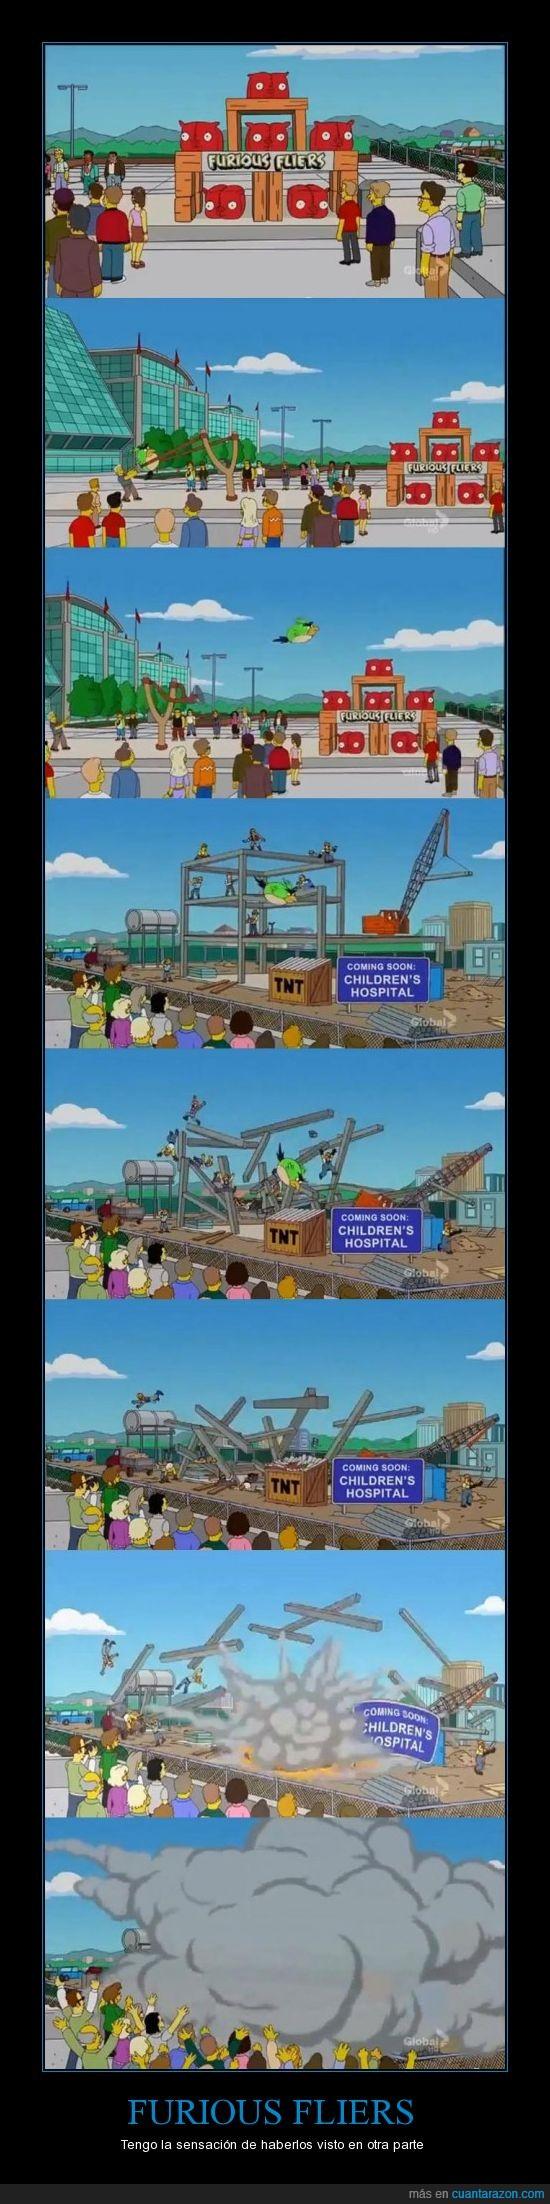 angry birds,Hospital de Niños  Destruido,juego,parodia,parody,simpsons